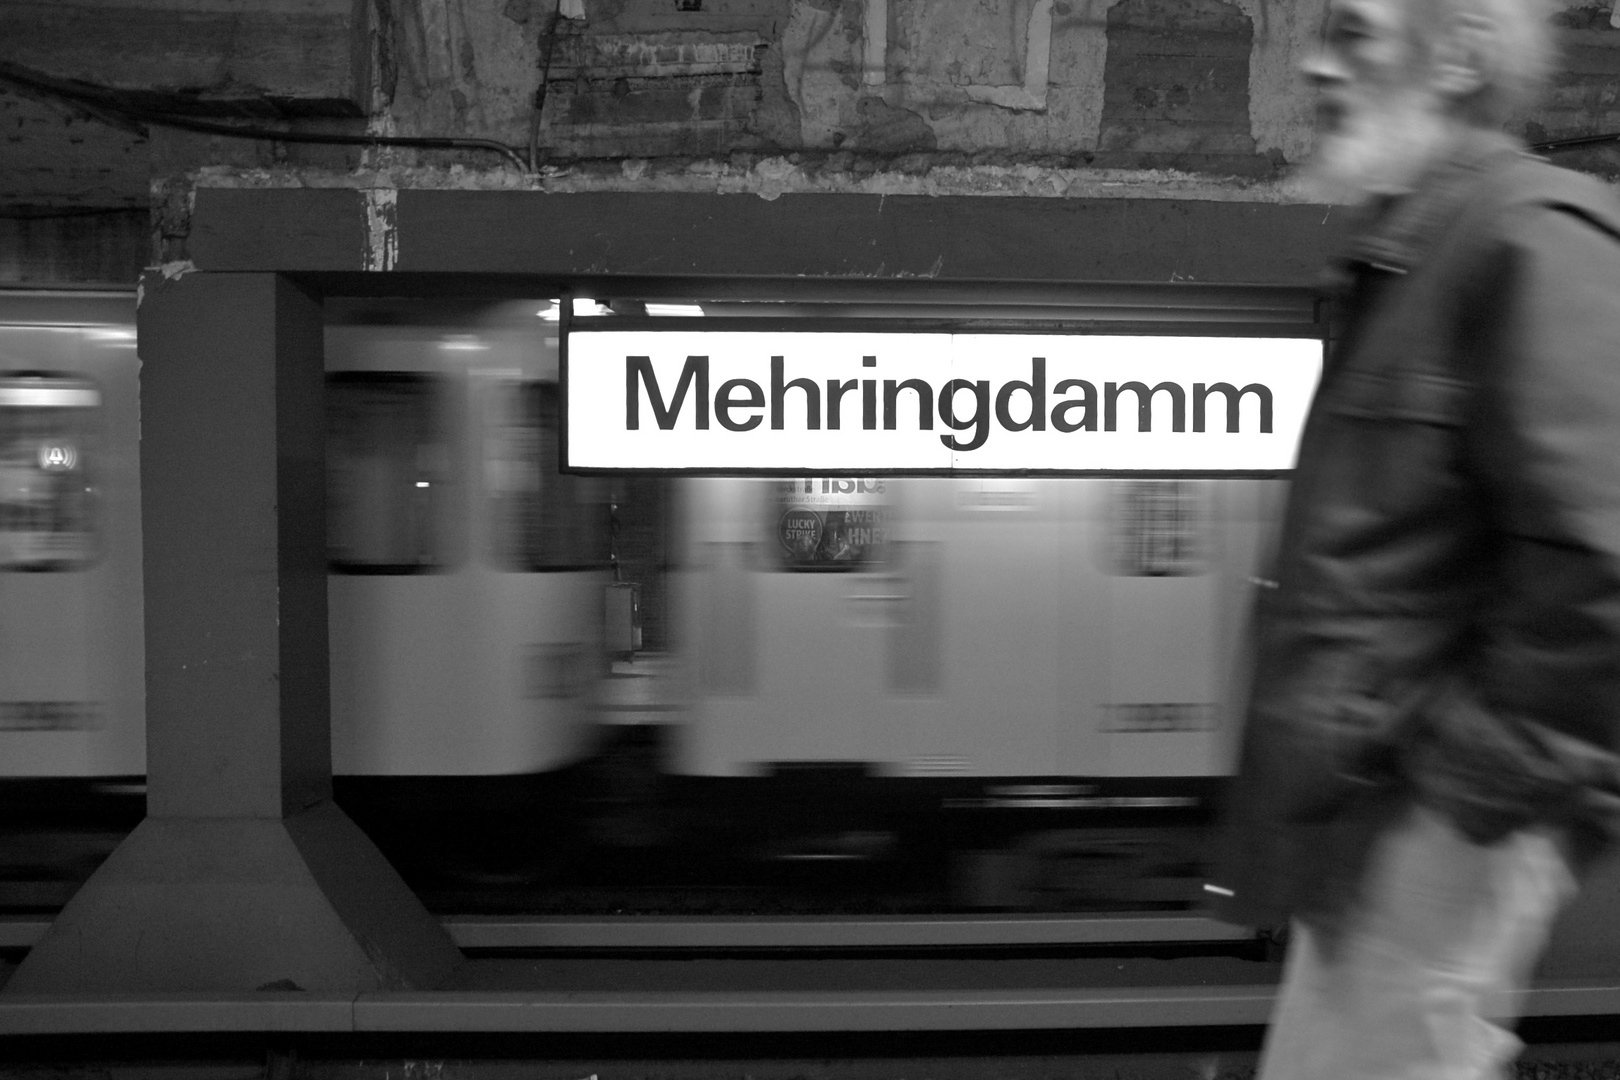 Kreuzberg U-Bahnhof Mehringdamm